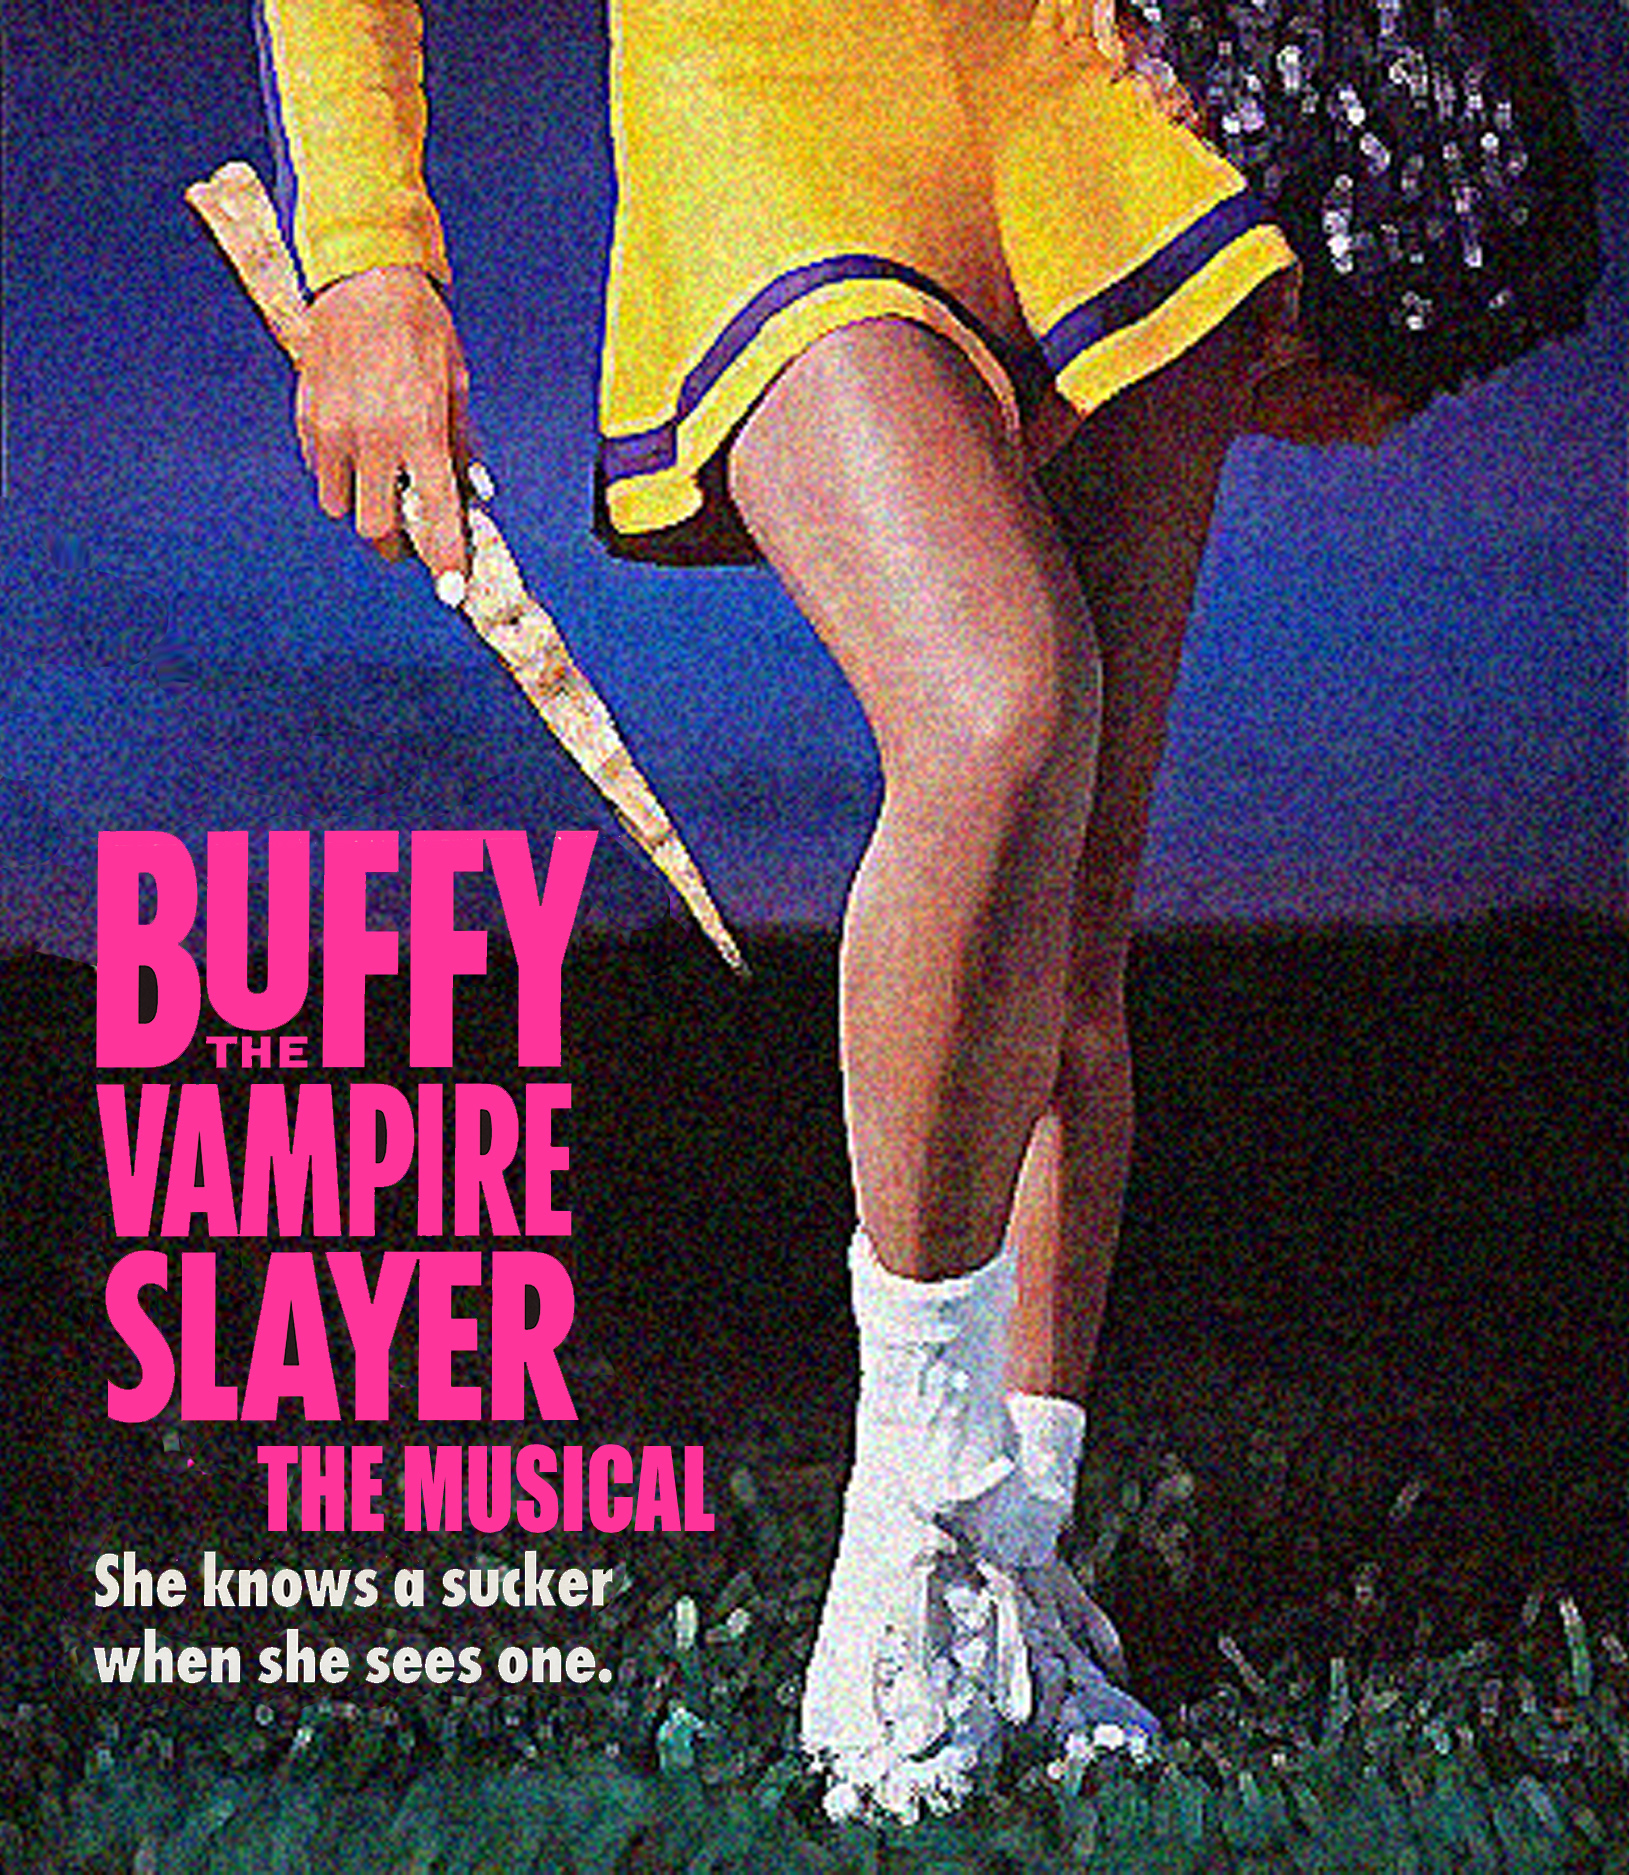 Buffy the Vampire Slayer, The Musical